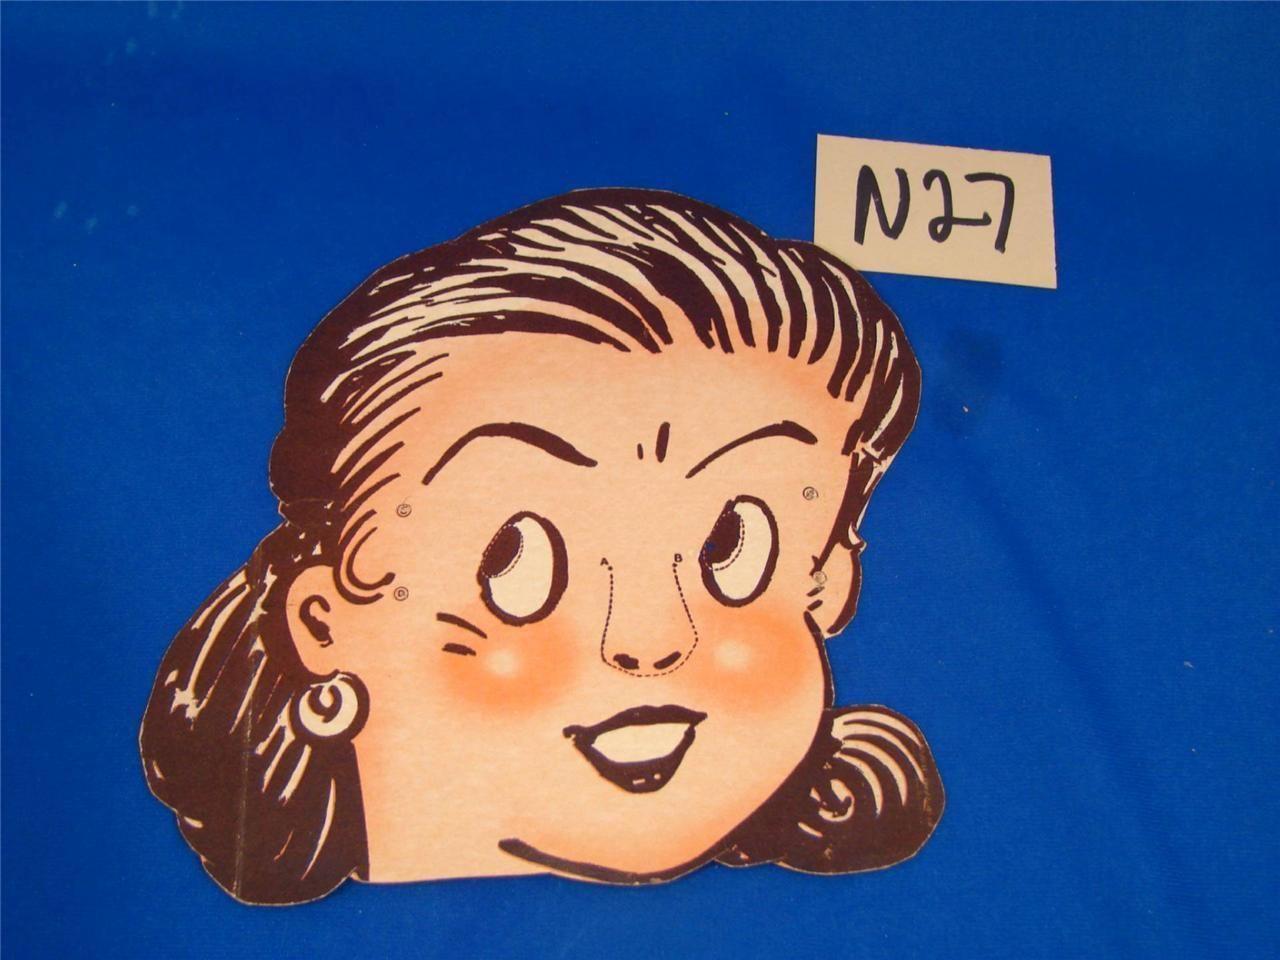 n27 vintage cereal box premium halloween mask girl - Premium Halloween Masks